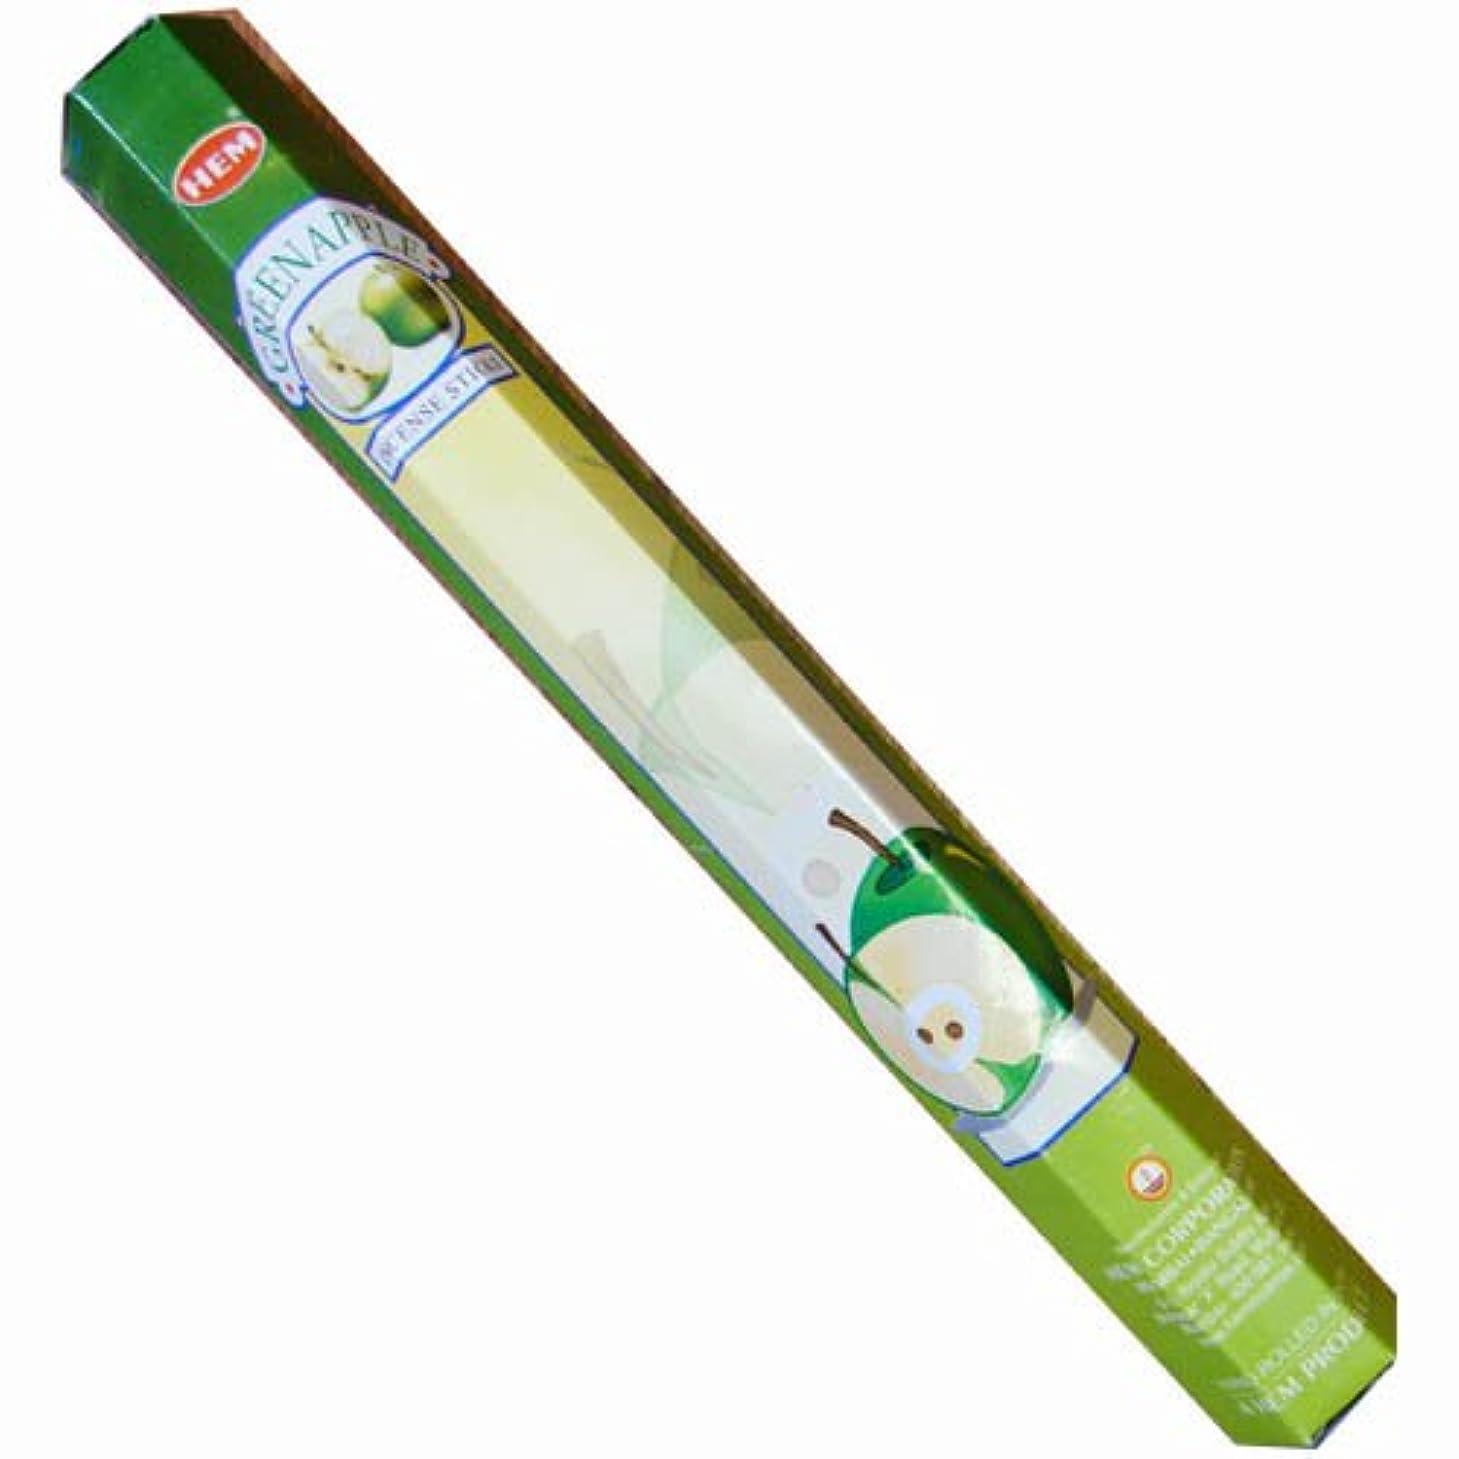 【AROMA】スティックお香/インセンス/六角香:グリーンアップル(HEM社)